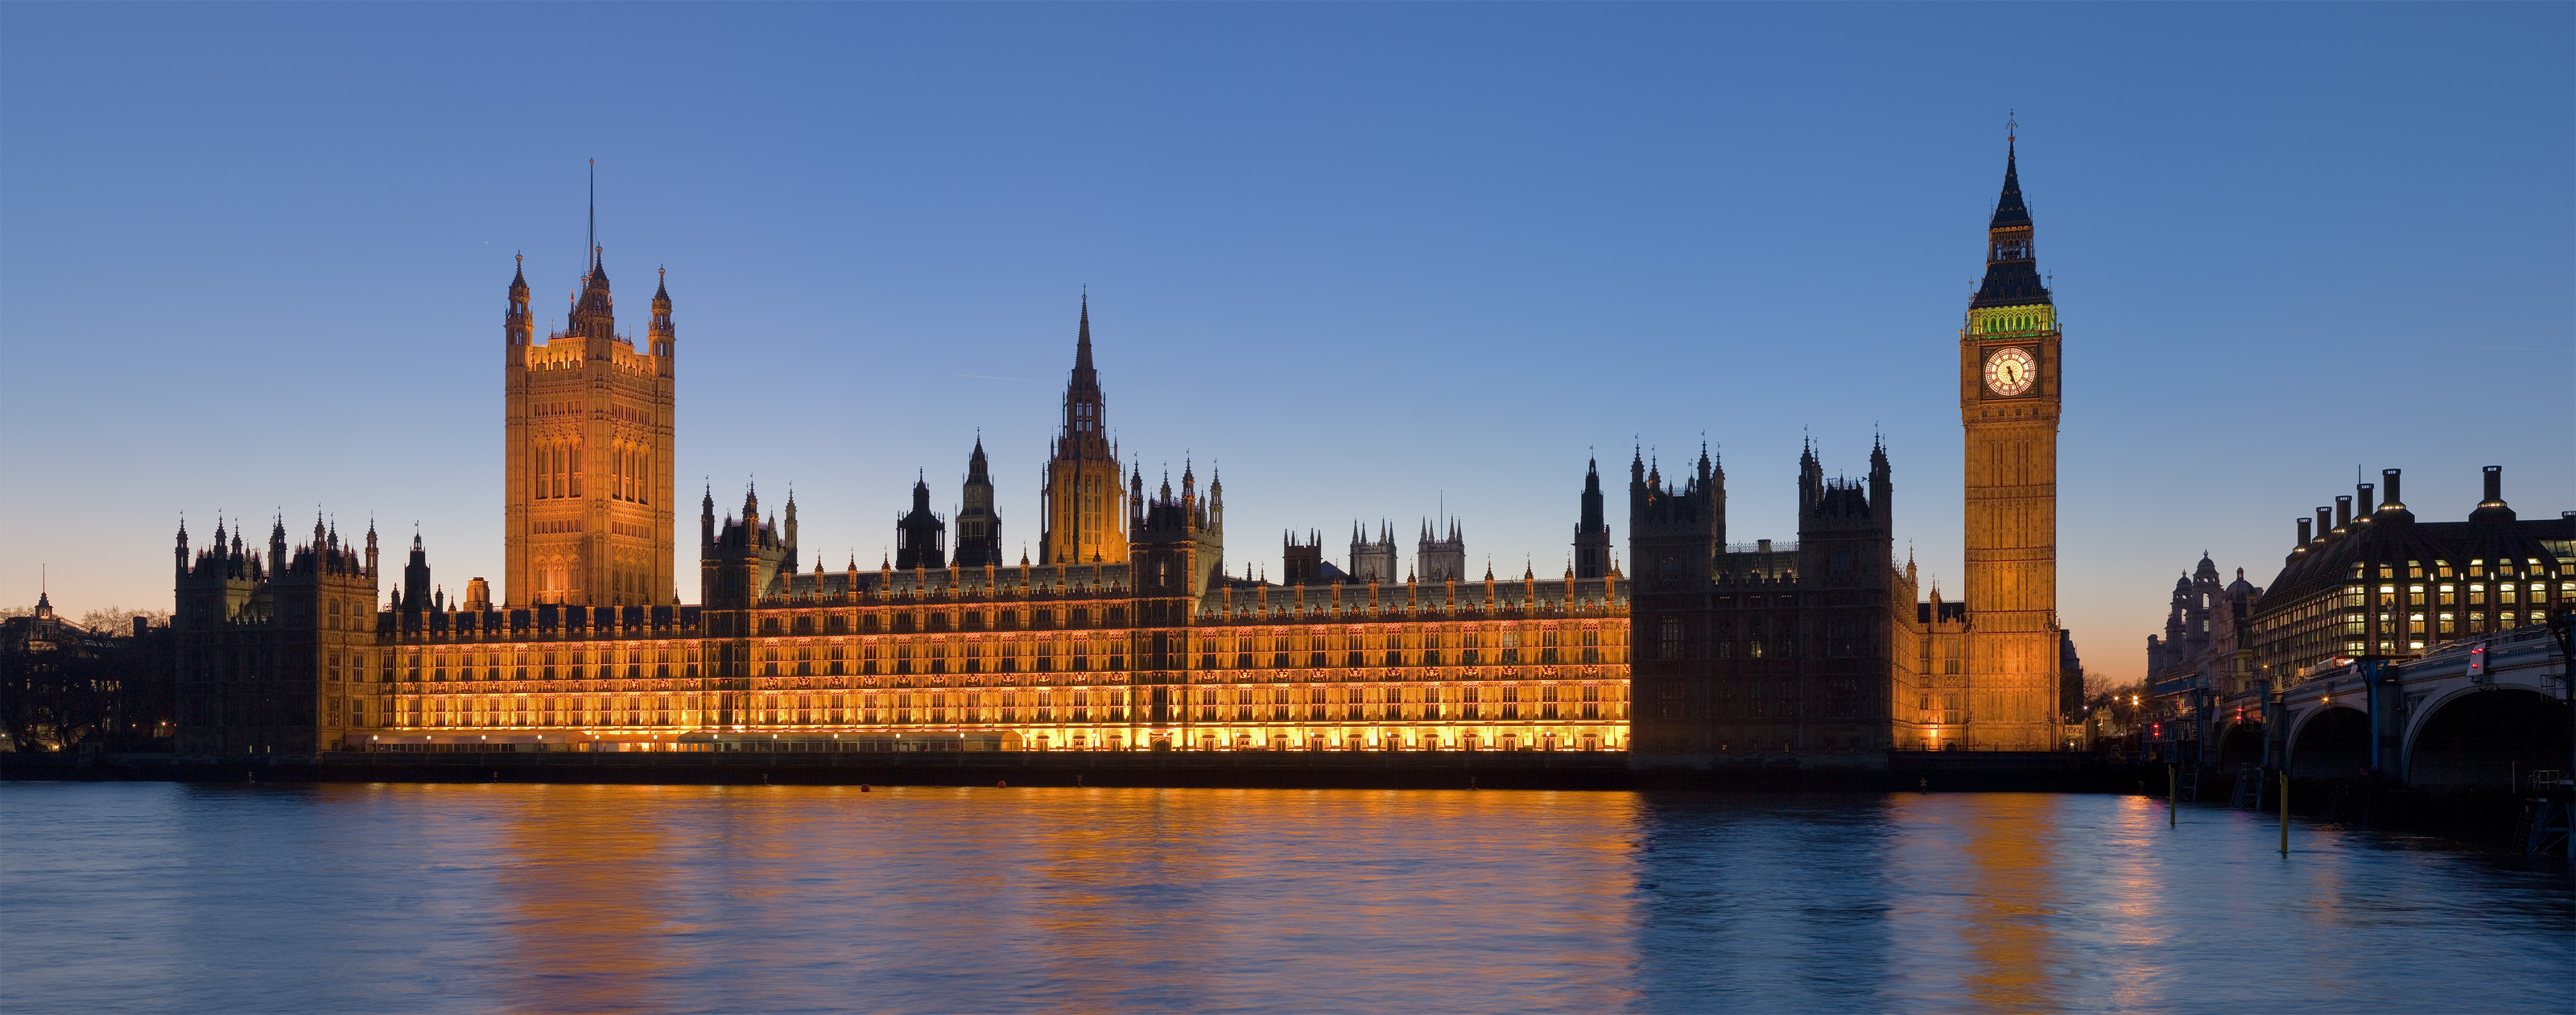 Dieci cose da fare a Londra